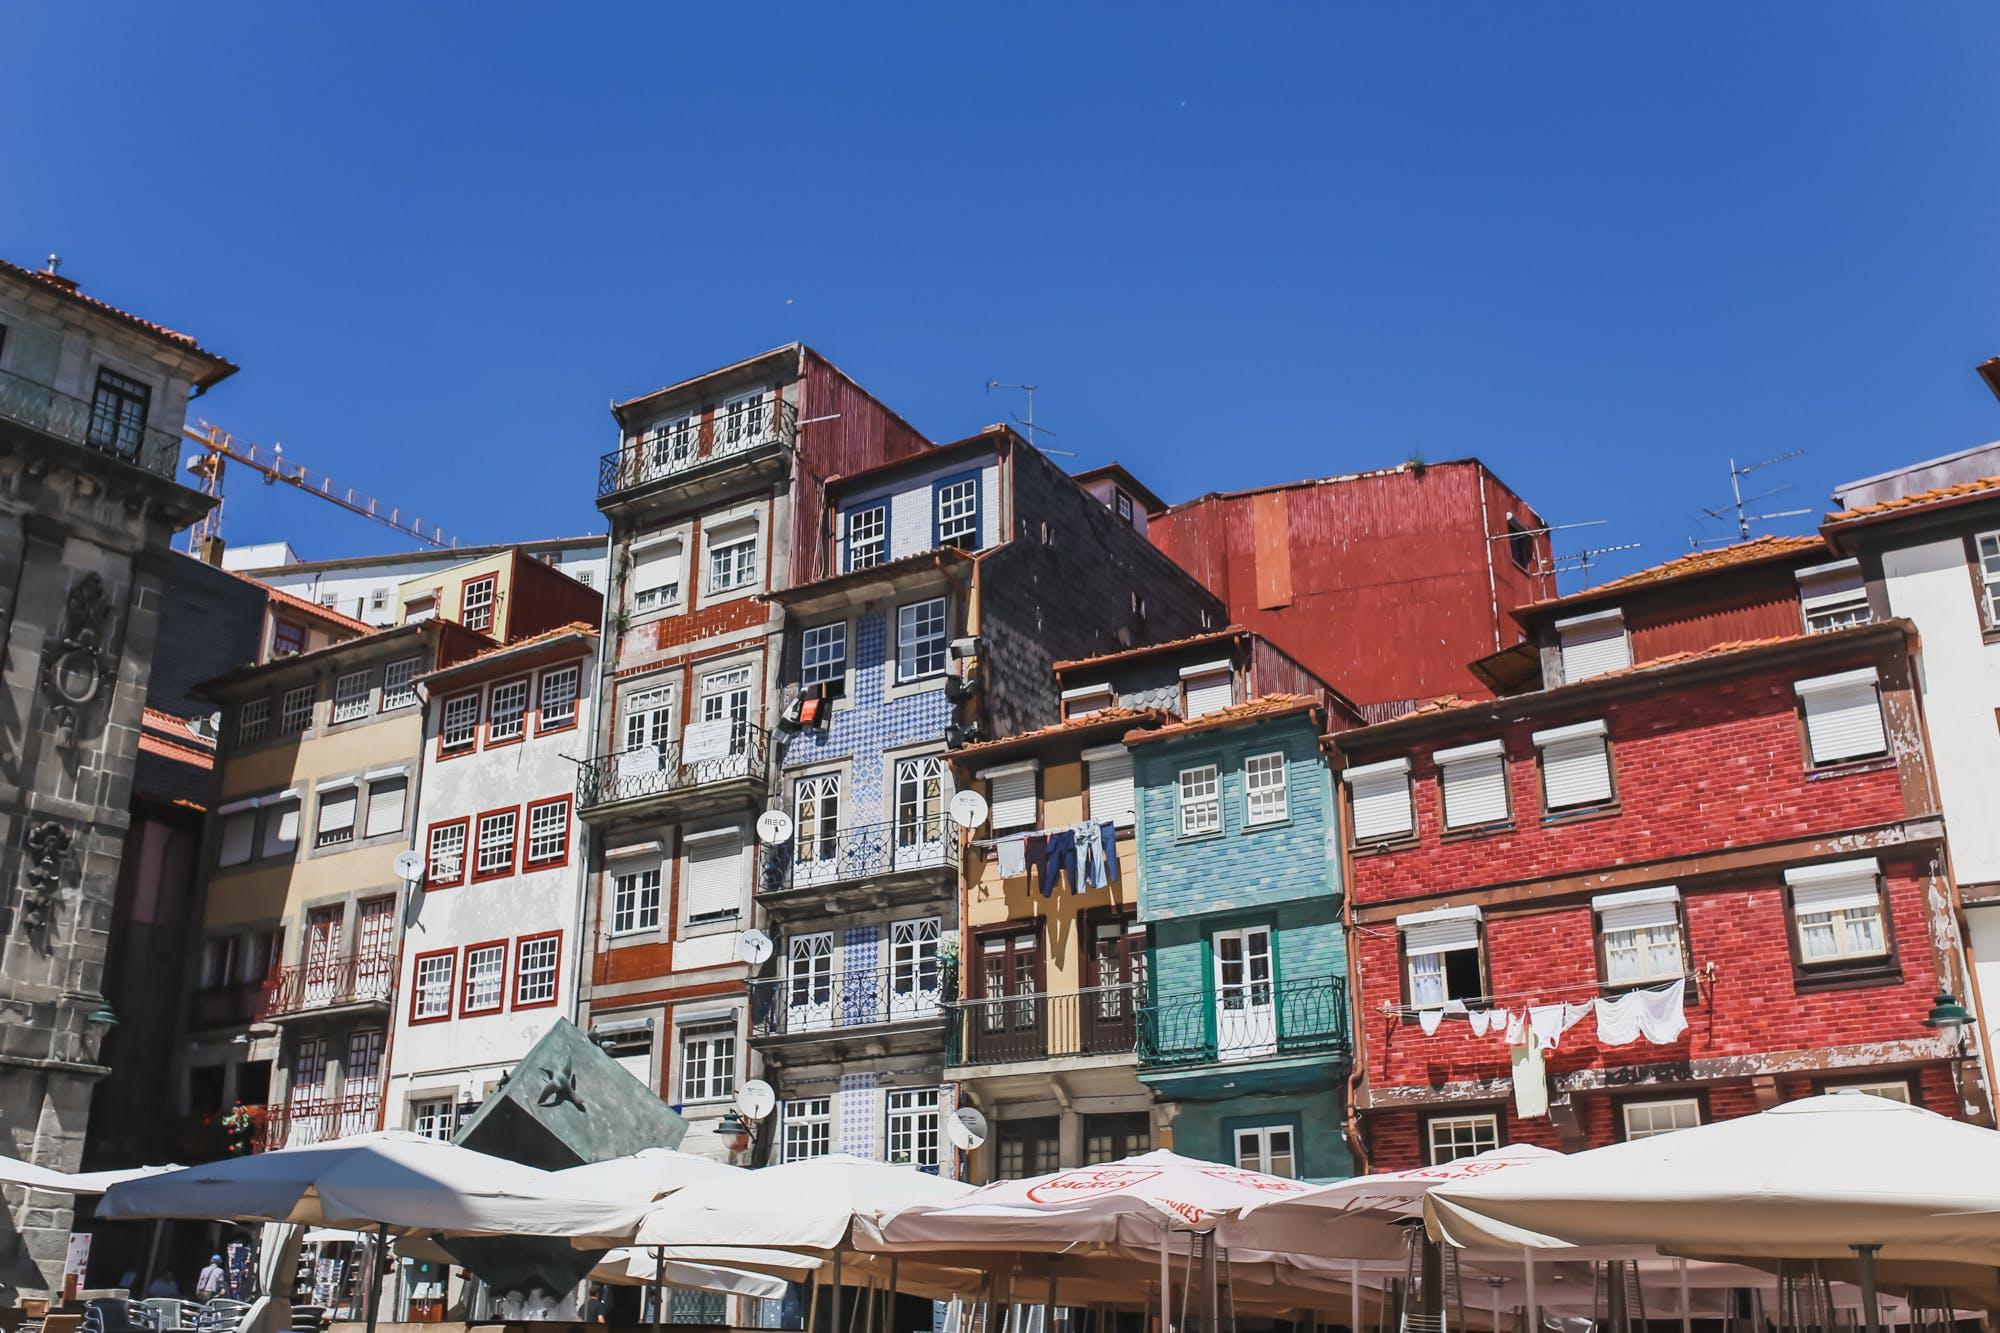 porto's ribeira district buildings